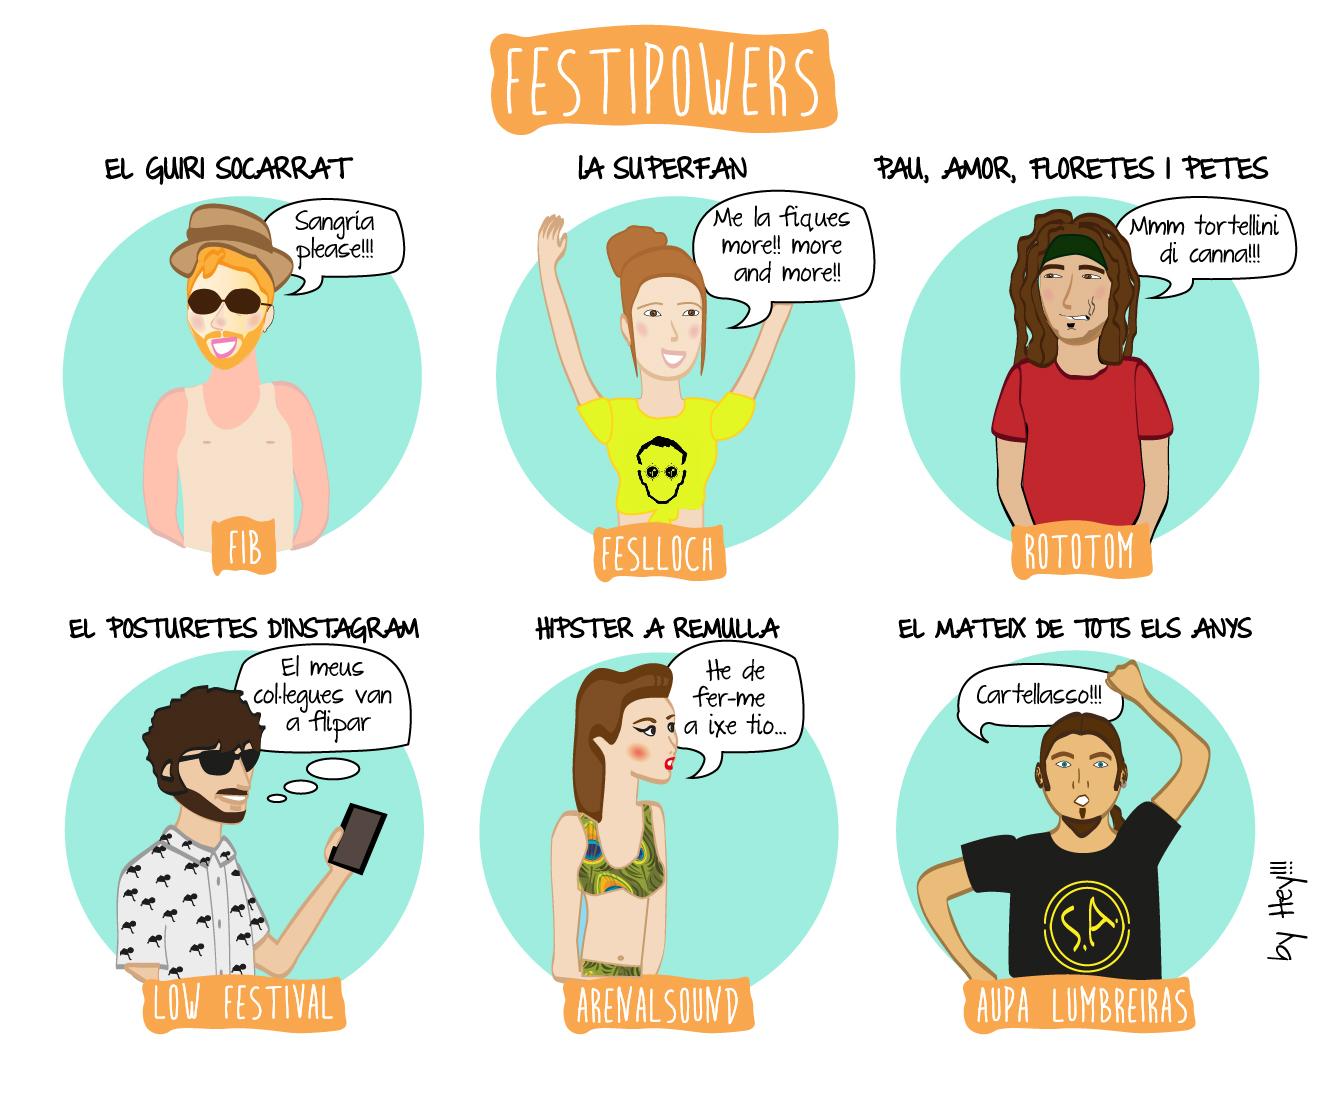 Festipowers by Hey